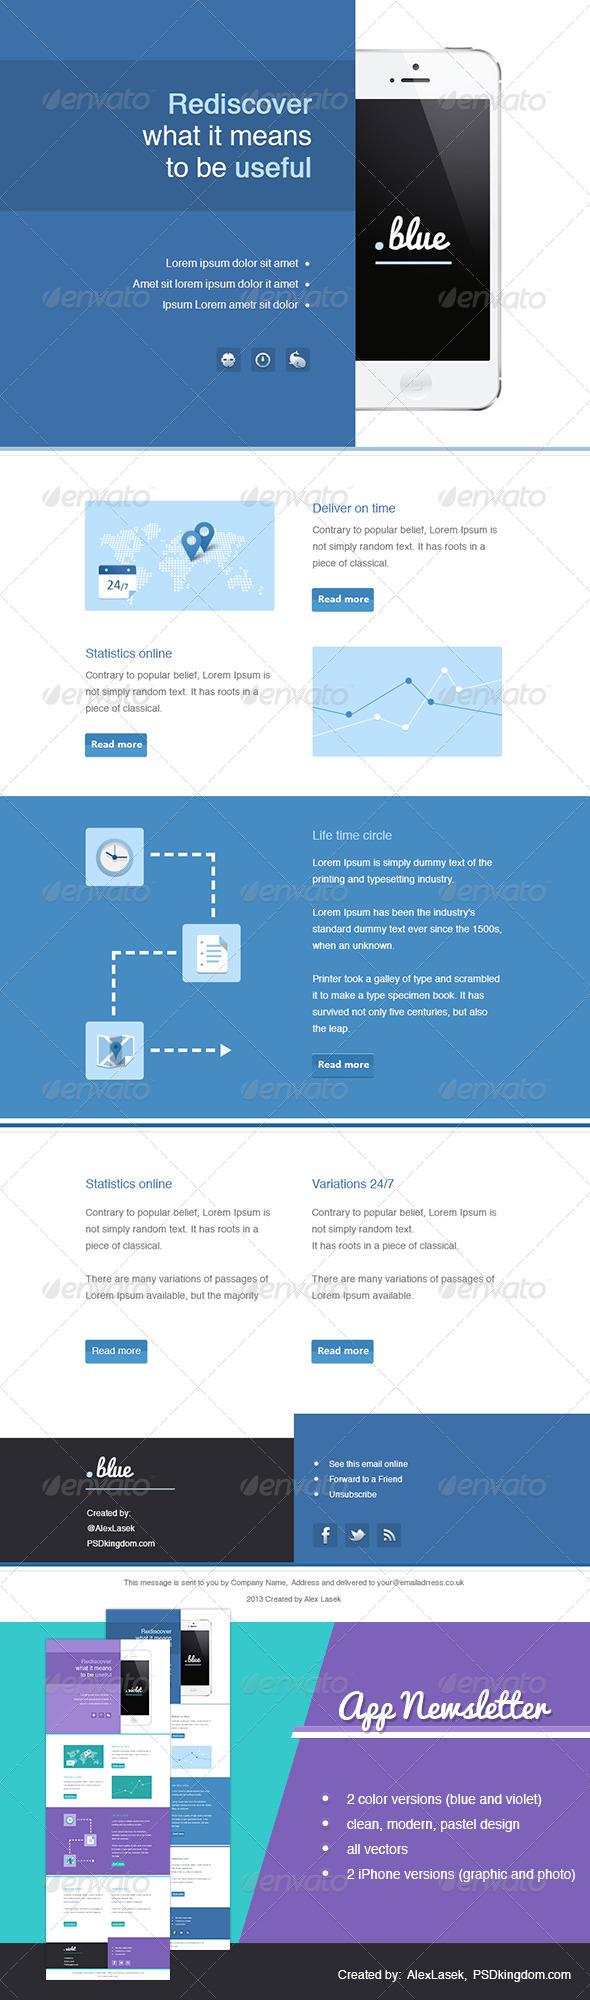 google apps email templates - app enewsletter templates blue violet graphicriver